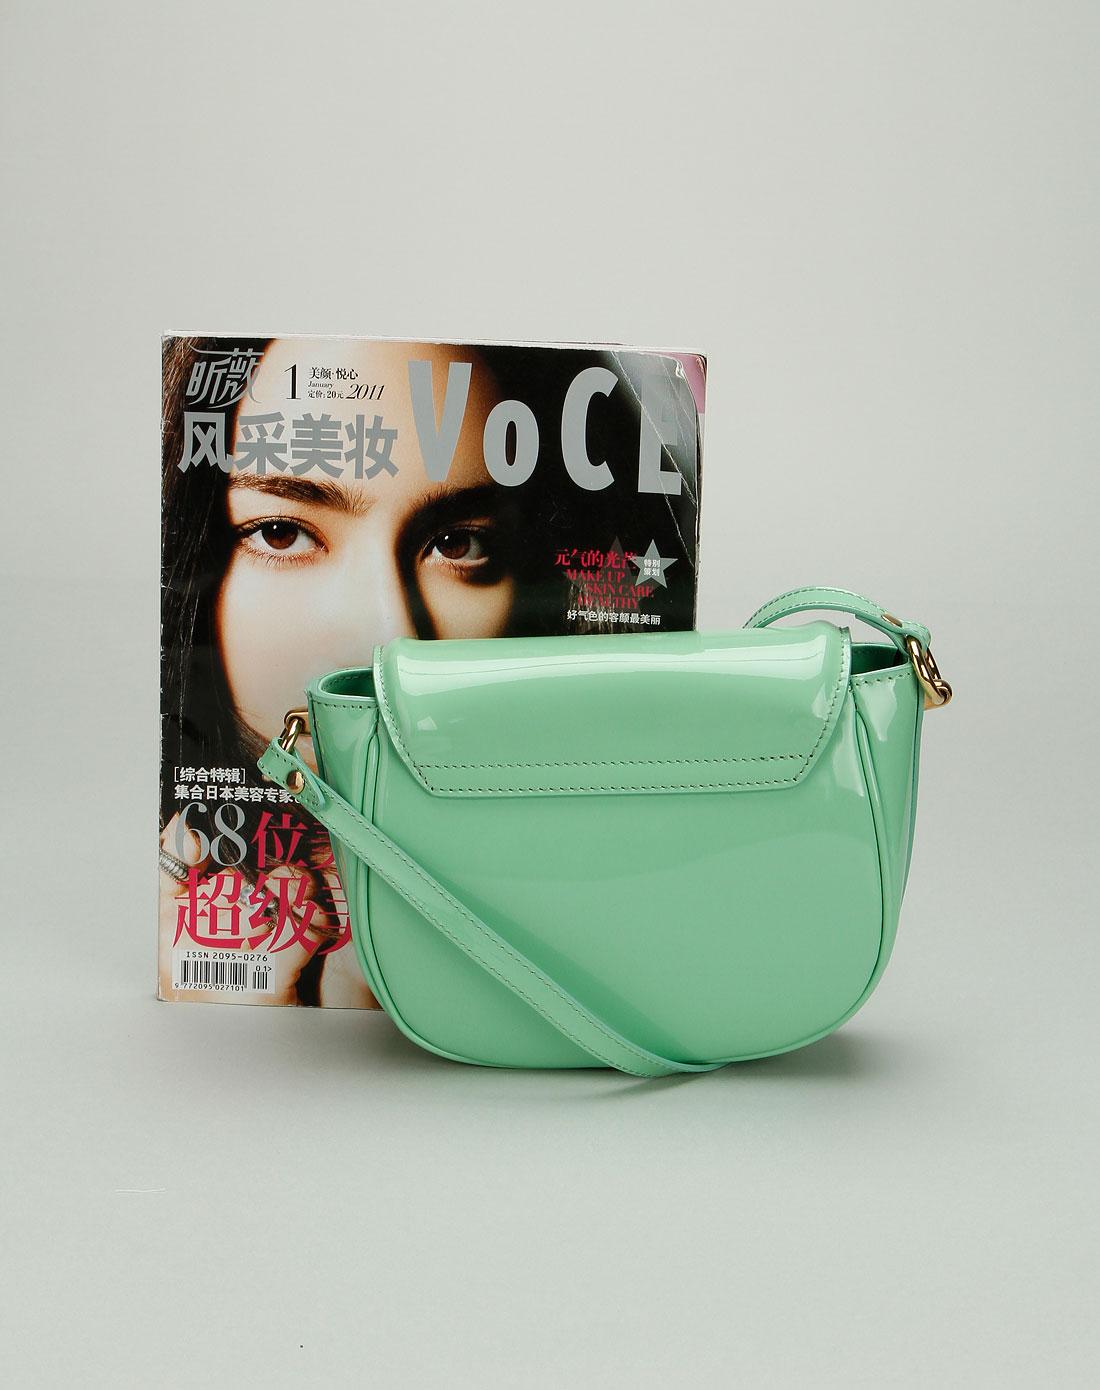 burberry女款绿色可爱时尚斜挎包37566761